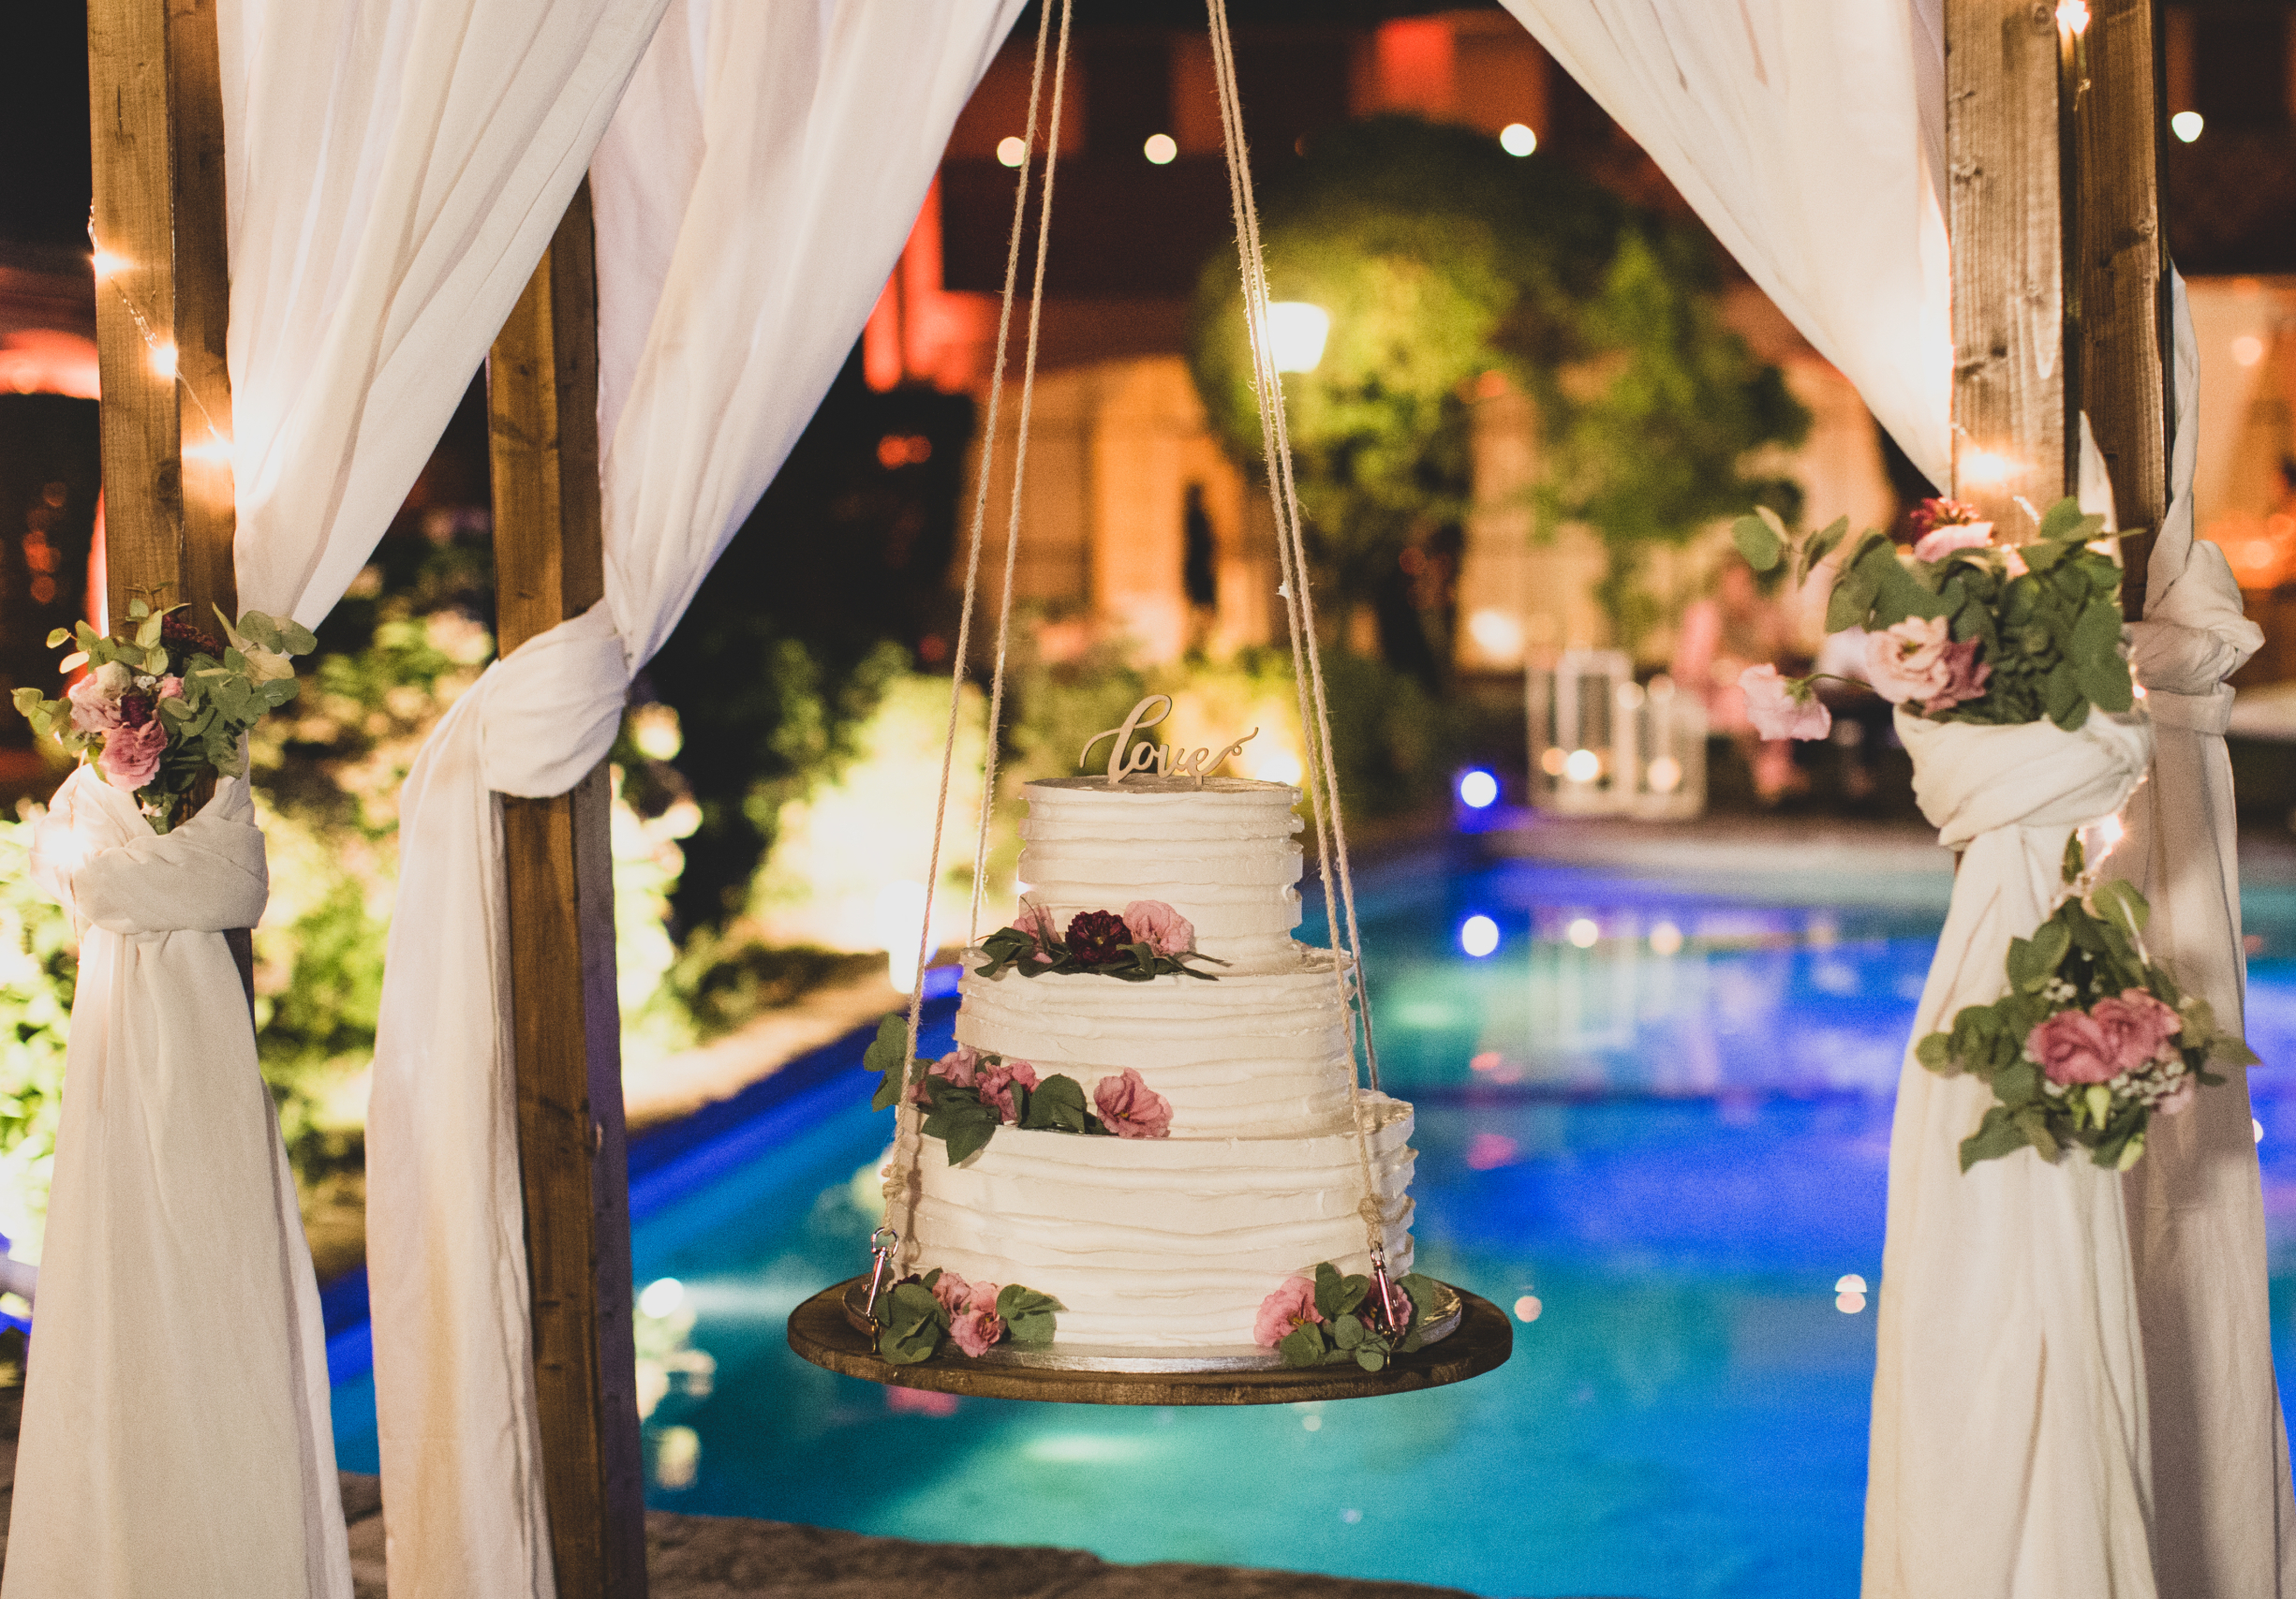 wedding, rome, luxuriwedding, borgolegrazie, maziana, bracciano, love, Friends, Cake, weddingcake